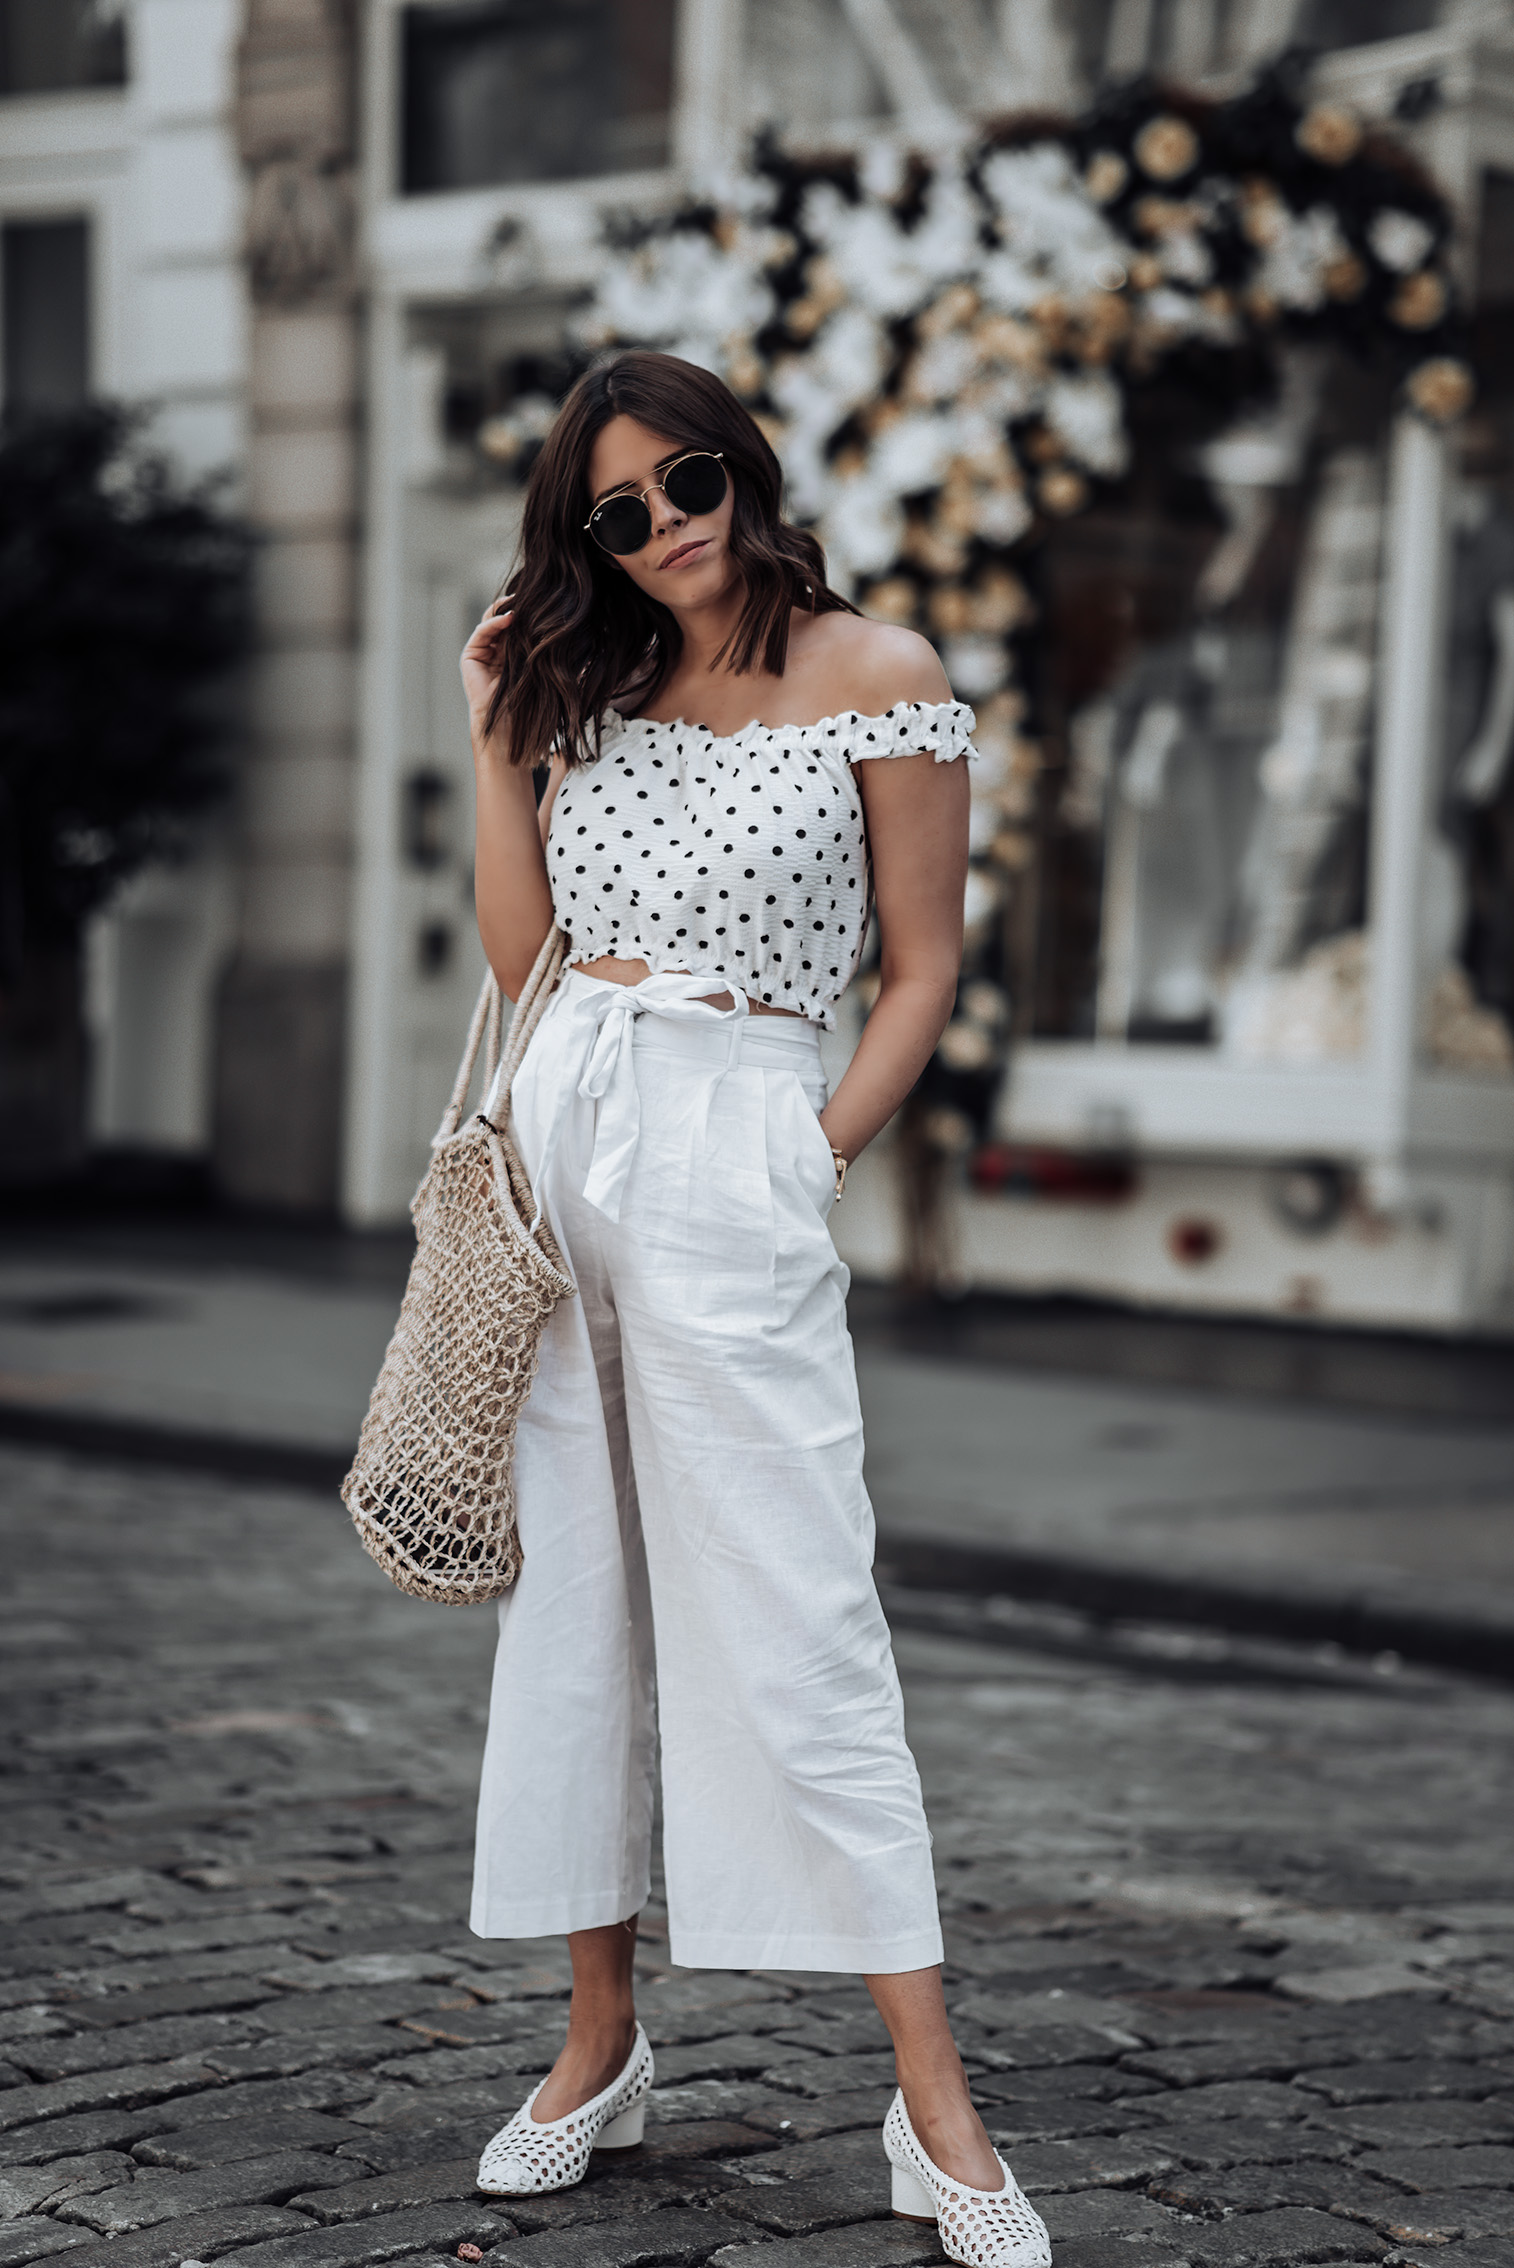 Memorial Day Sales | ASOS Tie Waist Pants (Identical here) | Topshop Polka Dot Crop Top | Topshop Woven Heels in White | Reformation Knit Market Bag (Similar) | #liketkit #paperbagpants #streetstyle #polkadots #minimalist